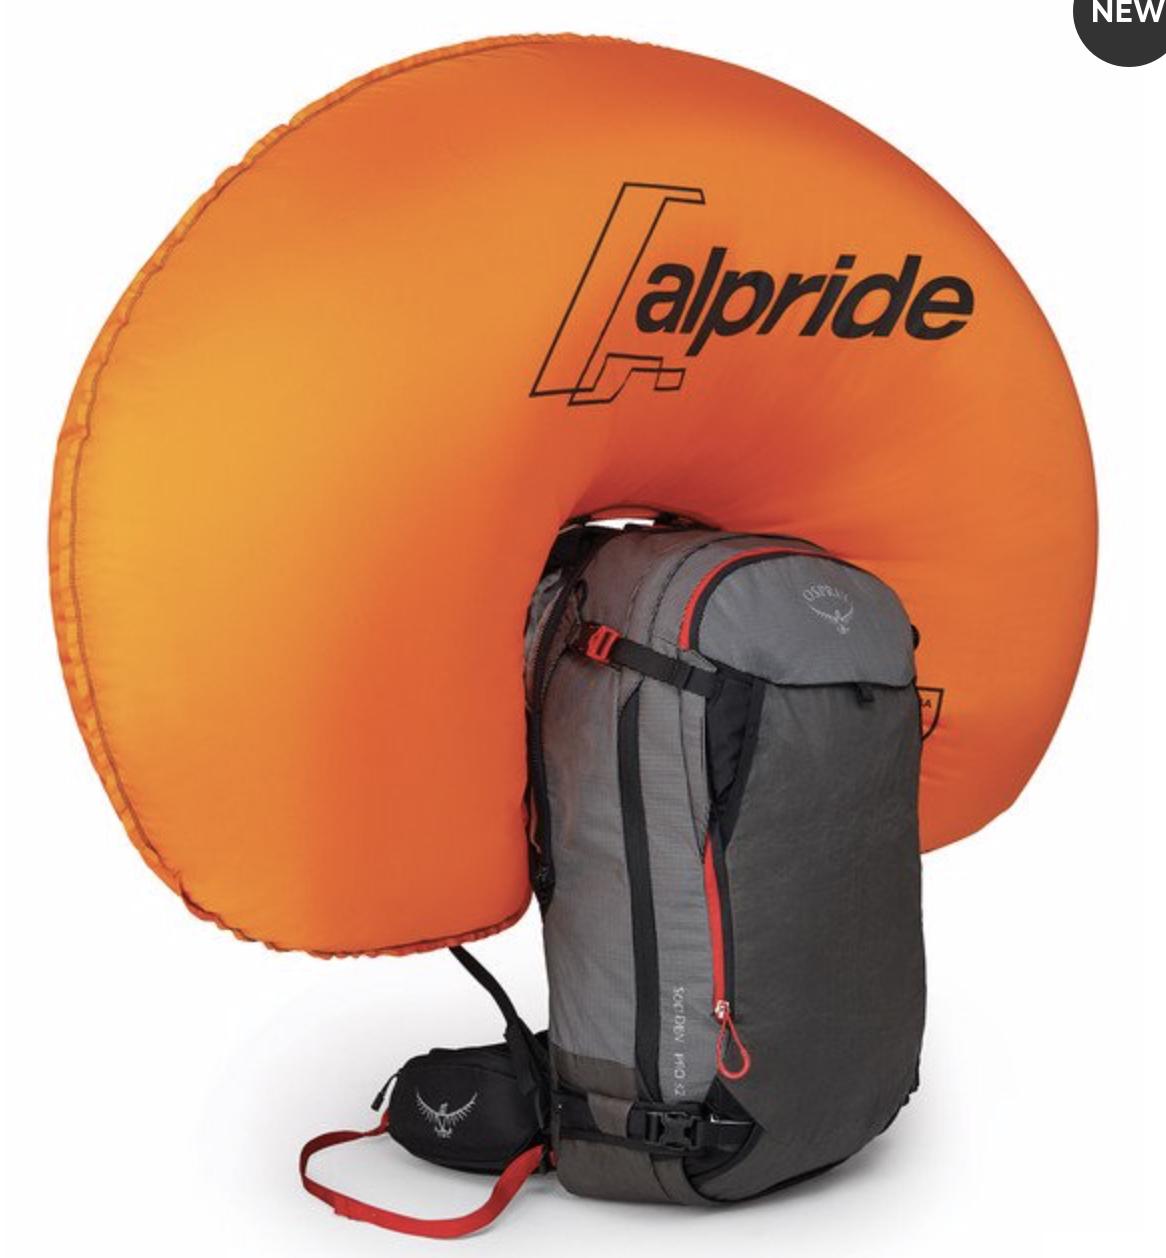 Soelden Pro Avy Airbag 32